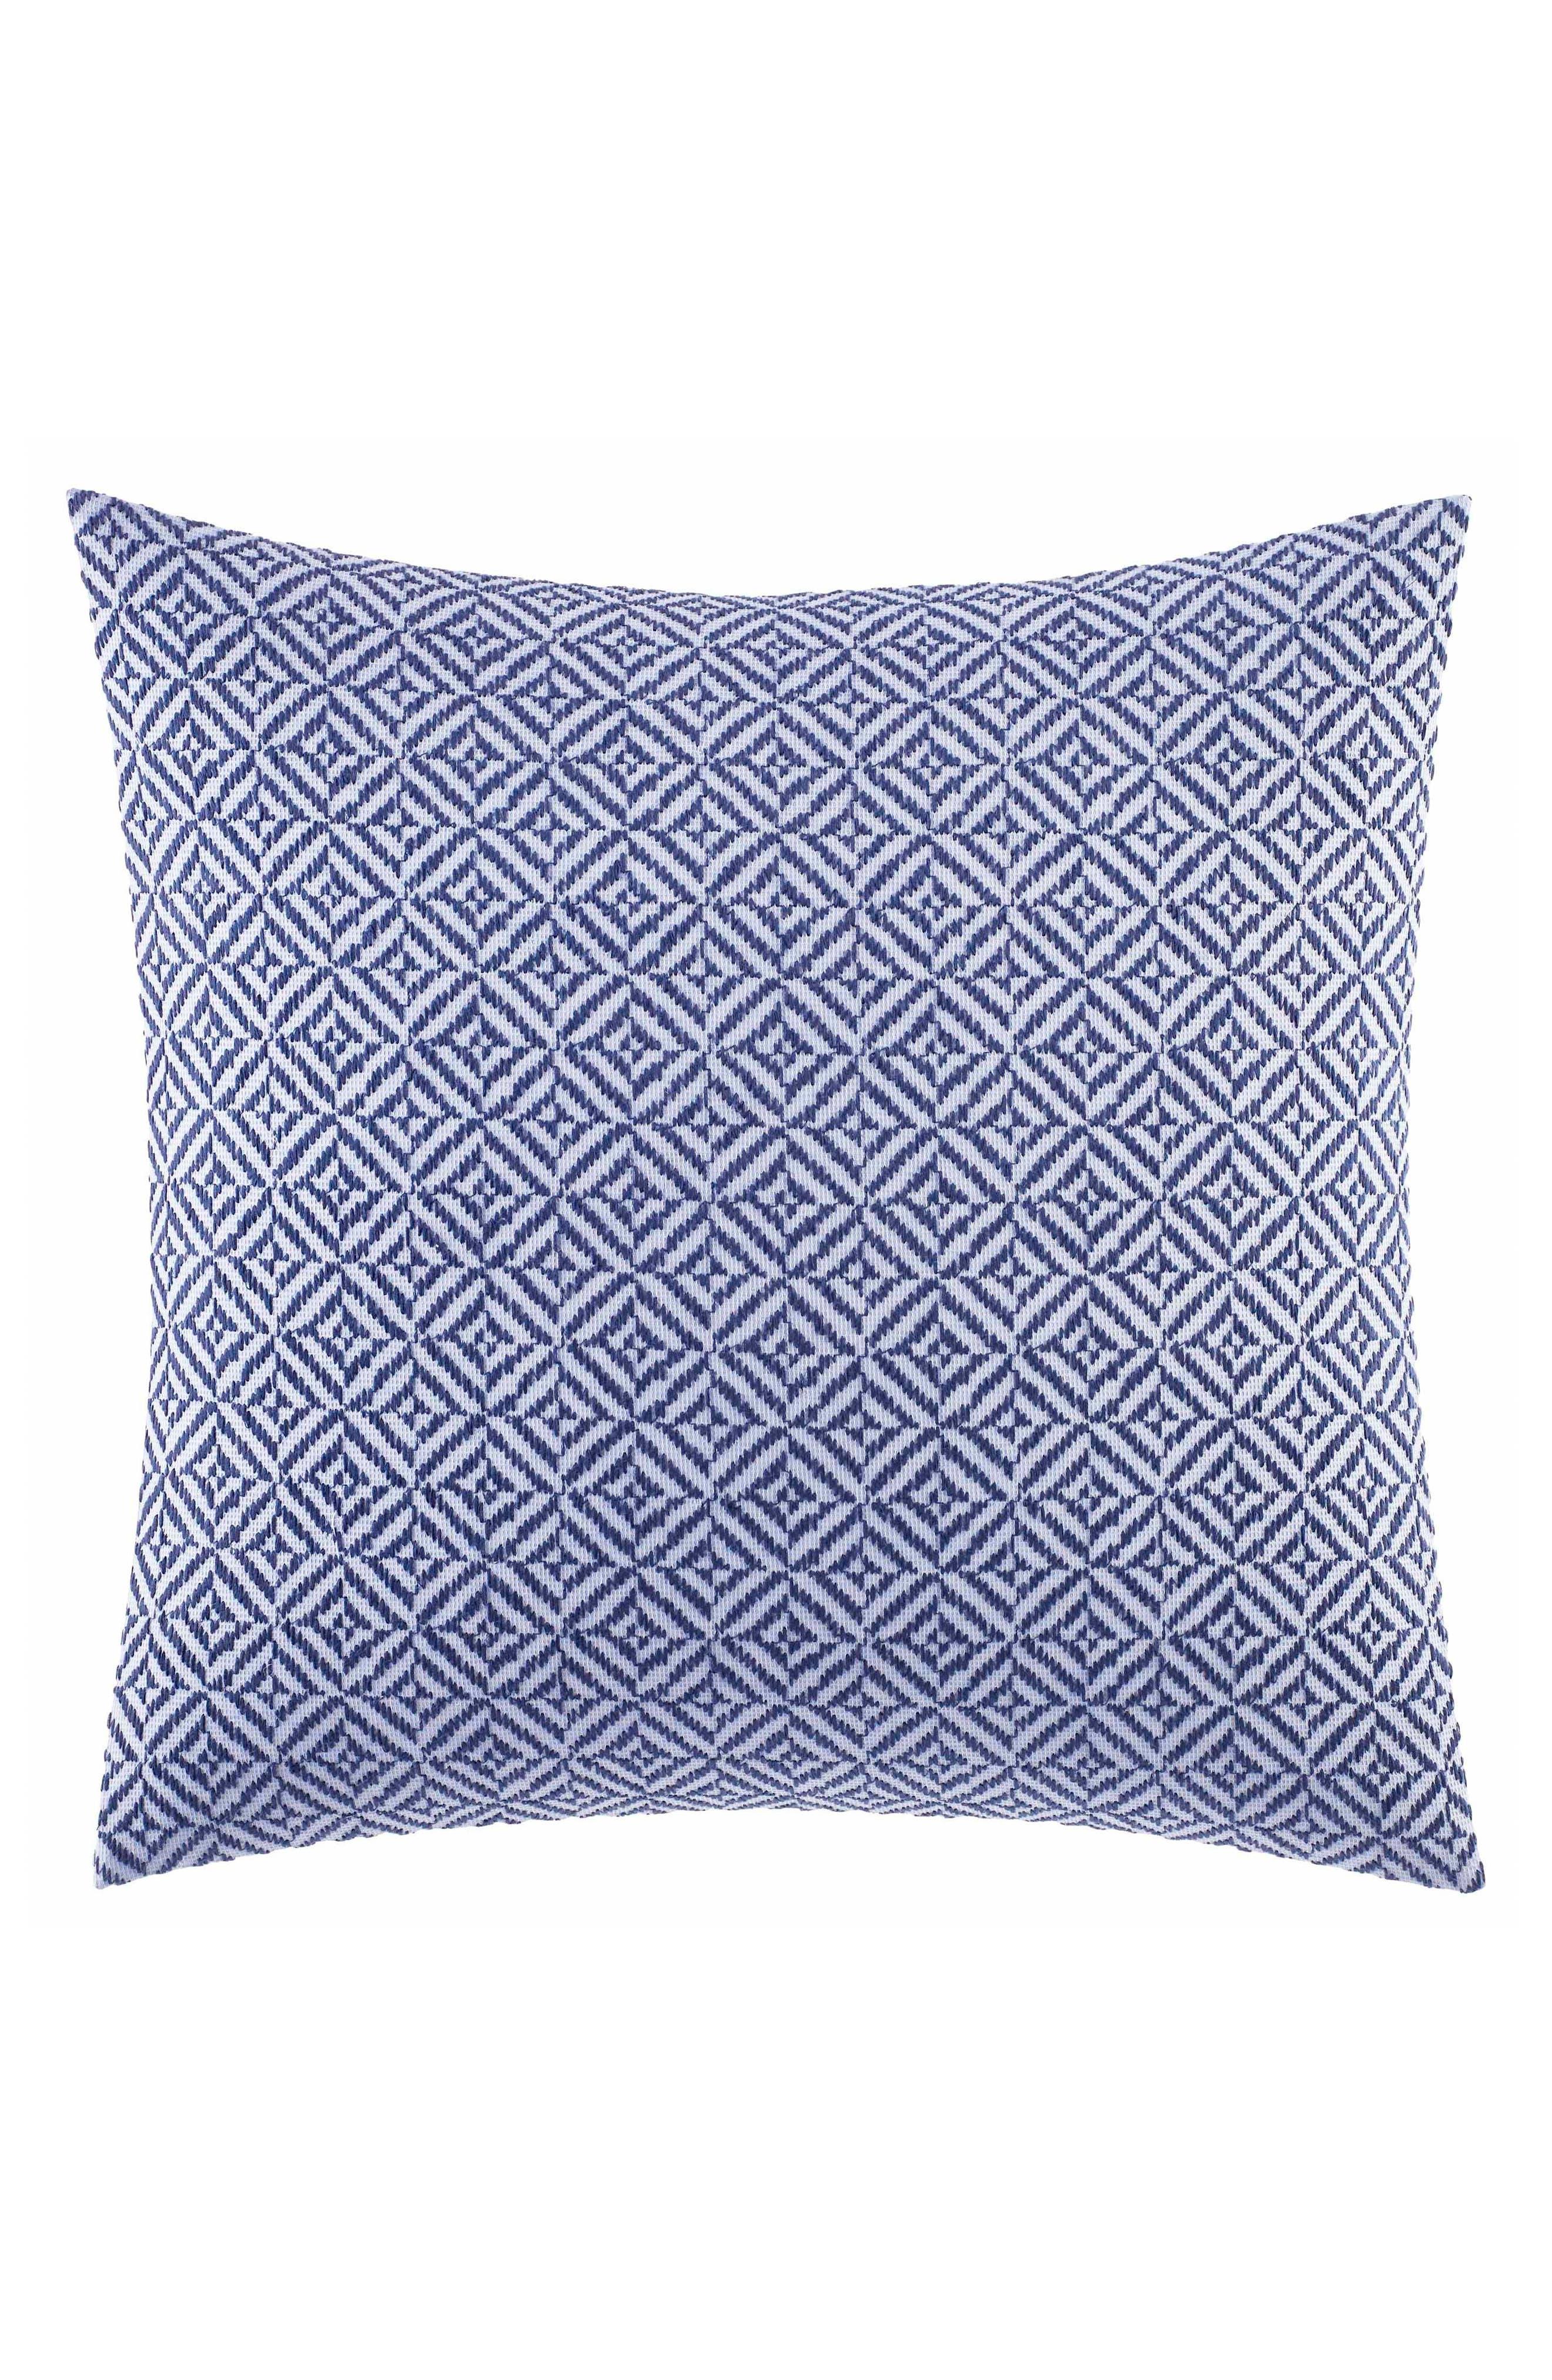 Chevron Accent Pillow,                         Main,                         color, Lilac